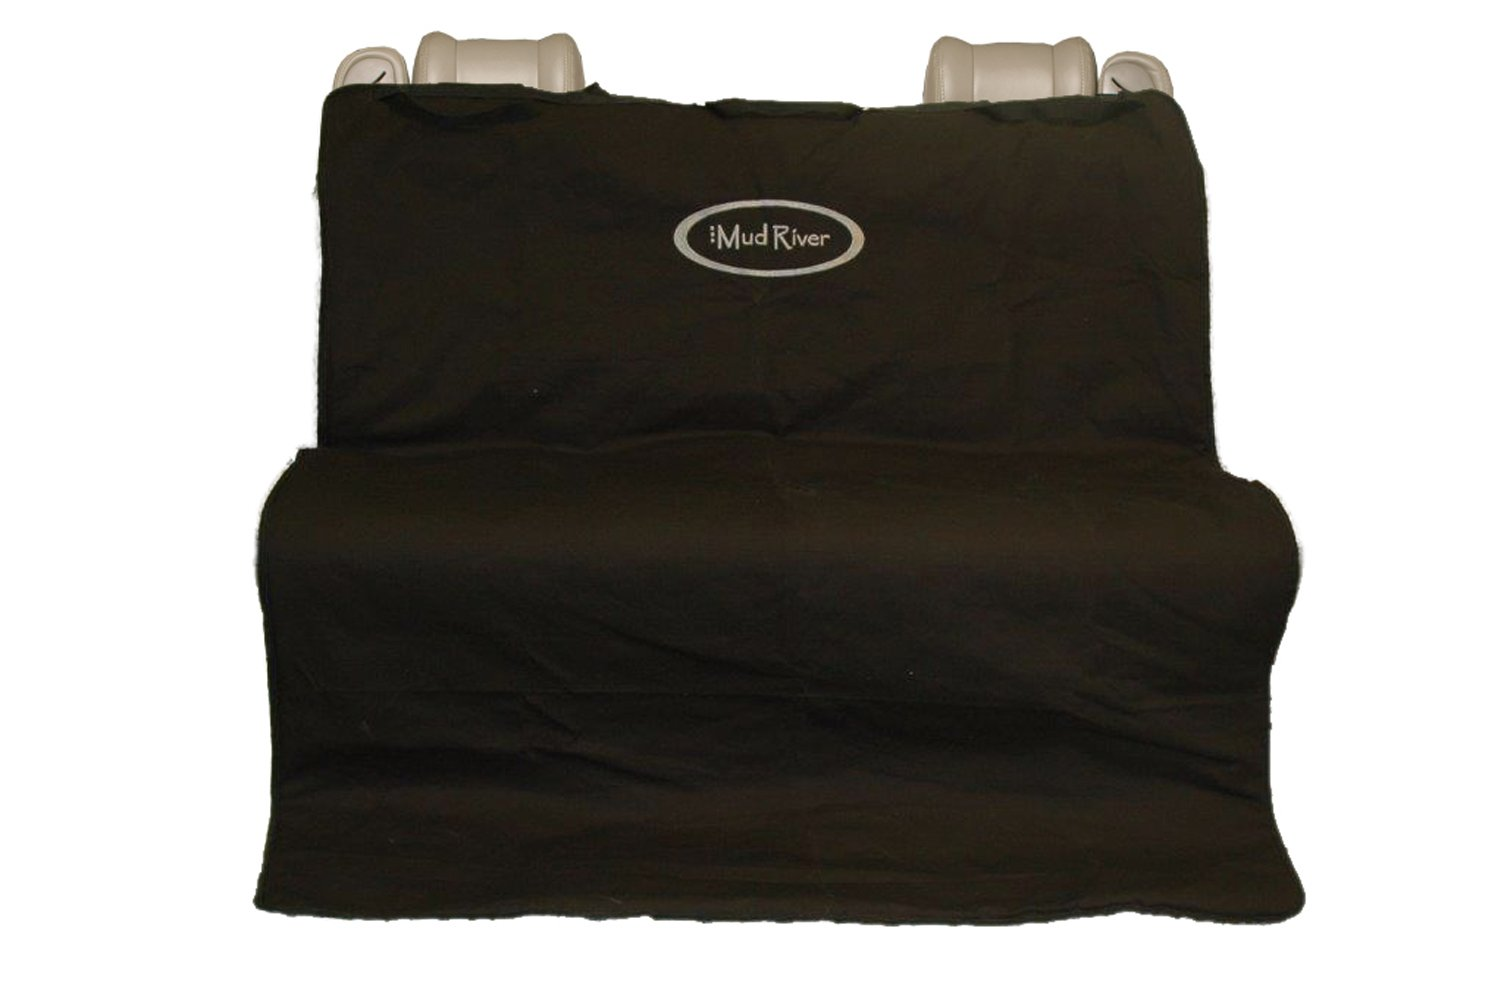 Mud River Mudriver Two Barrel Double Seat Cover Black, Regular